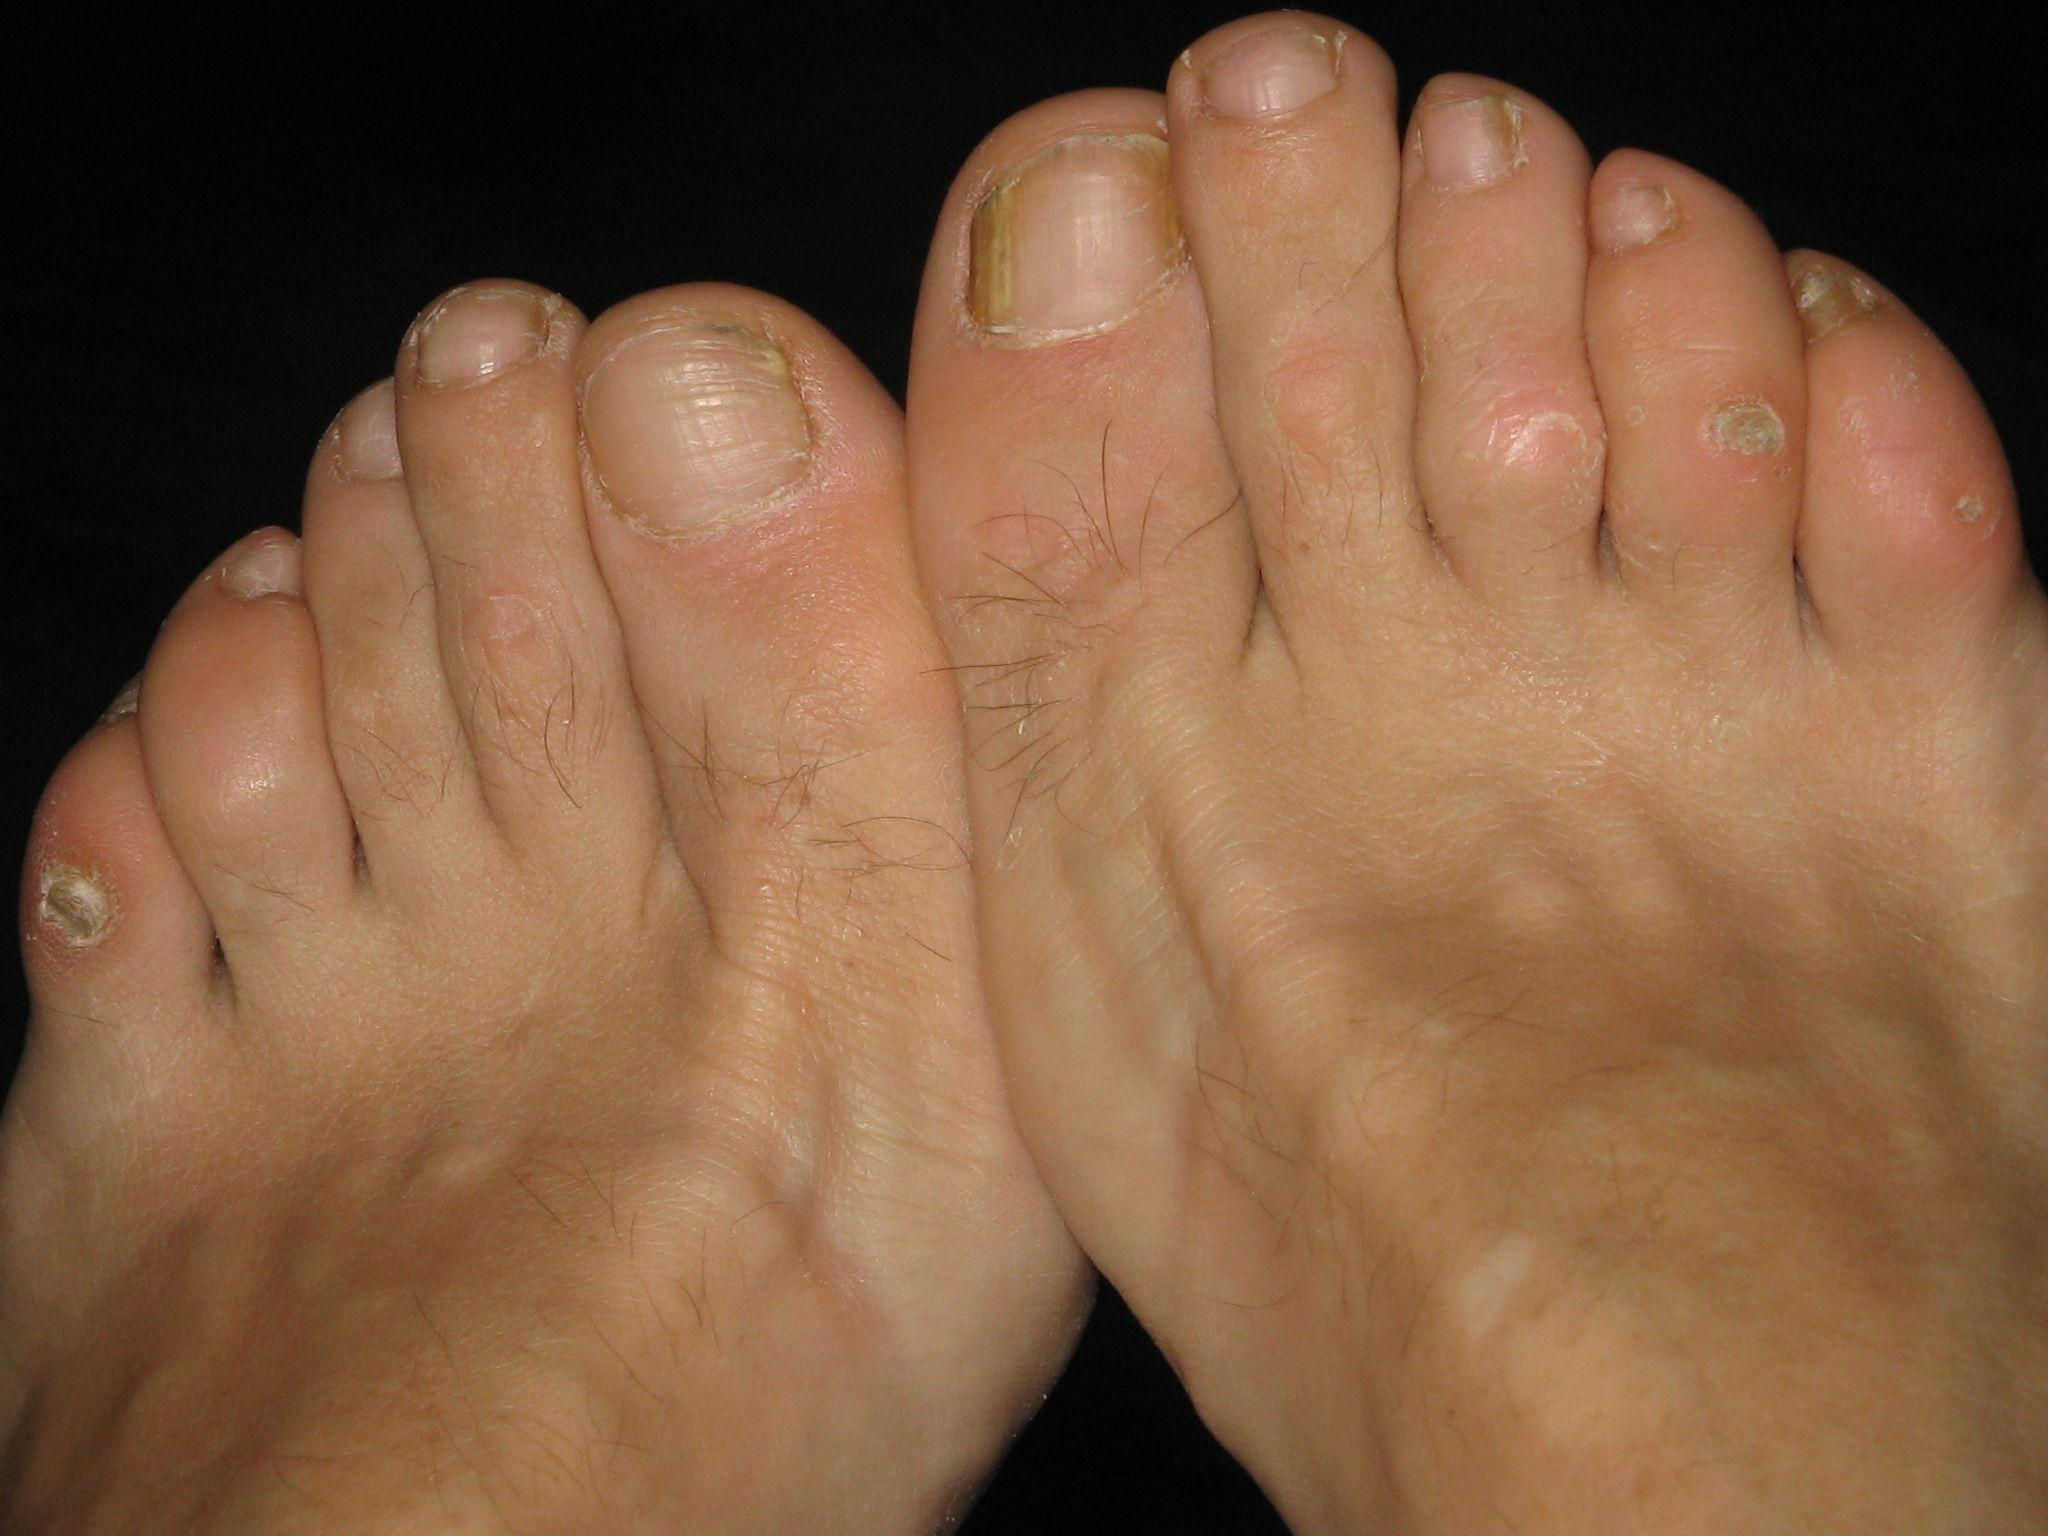 Corns, Calluses & Warts on Feet